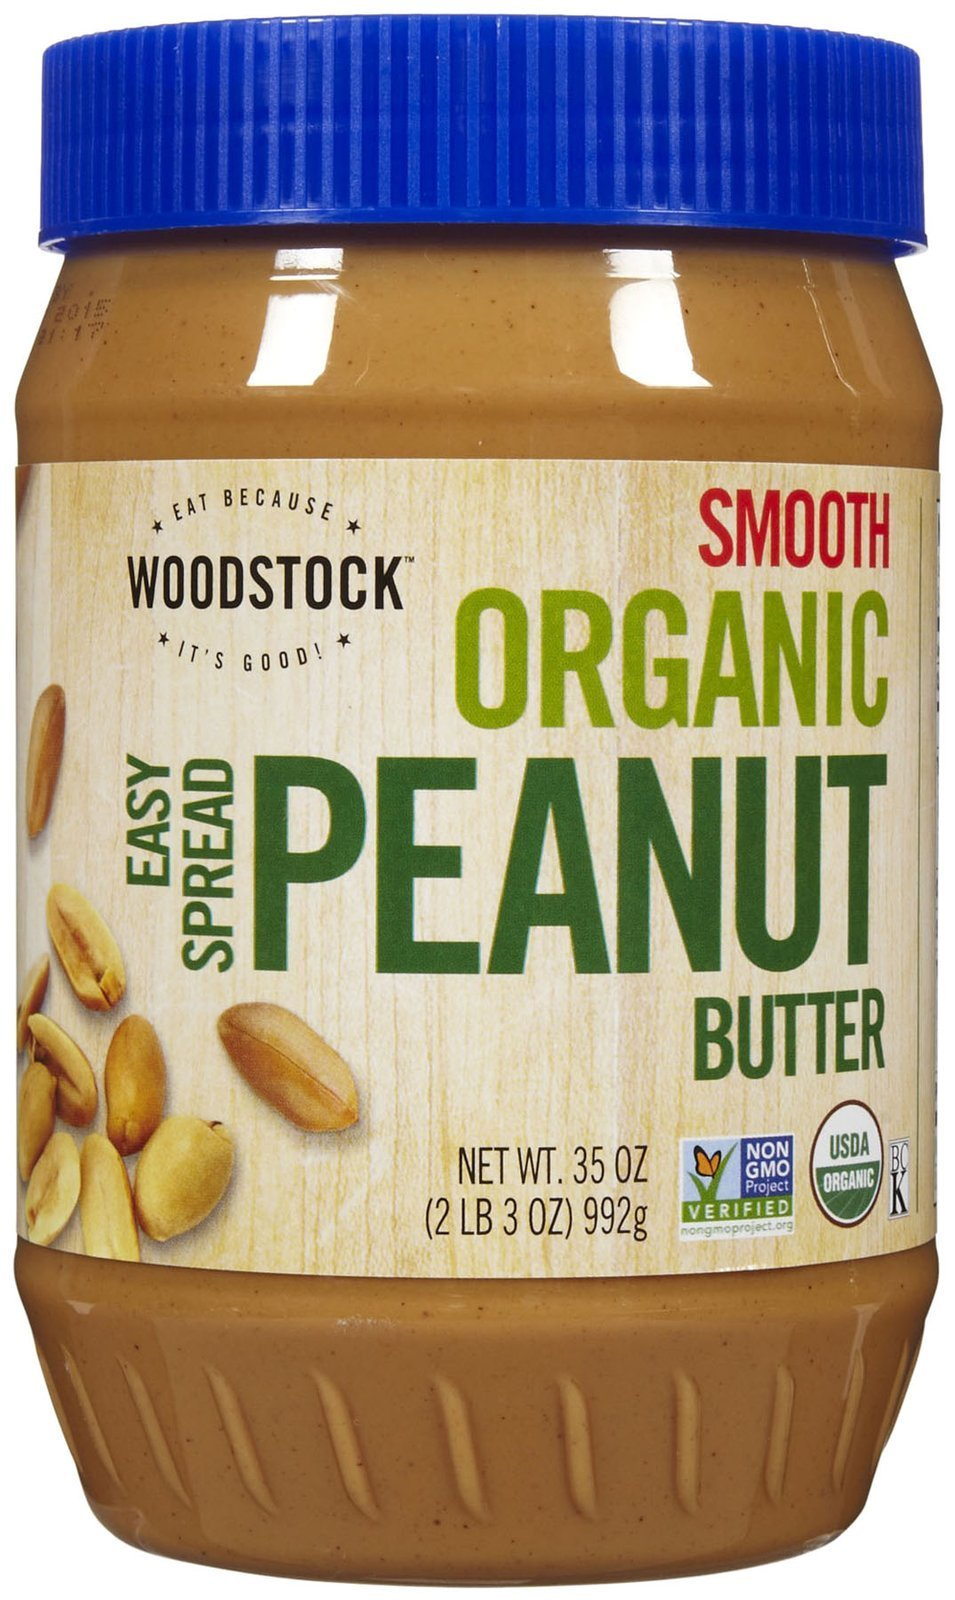 Woodstock Organic Smooth Peanut Butter, Salt Added, 35 oz